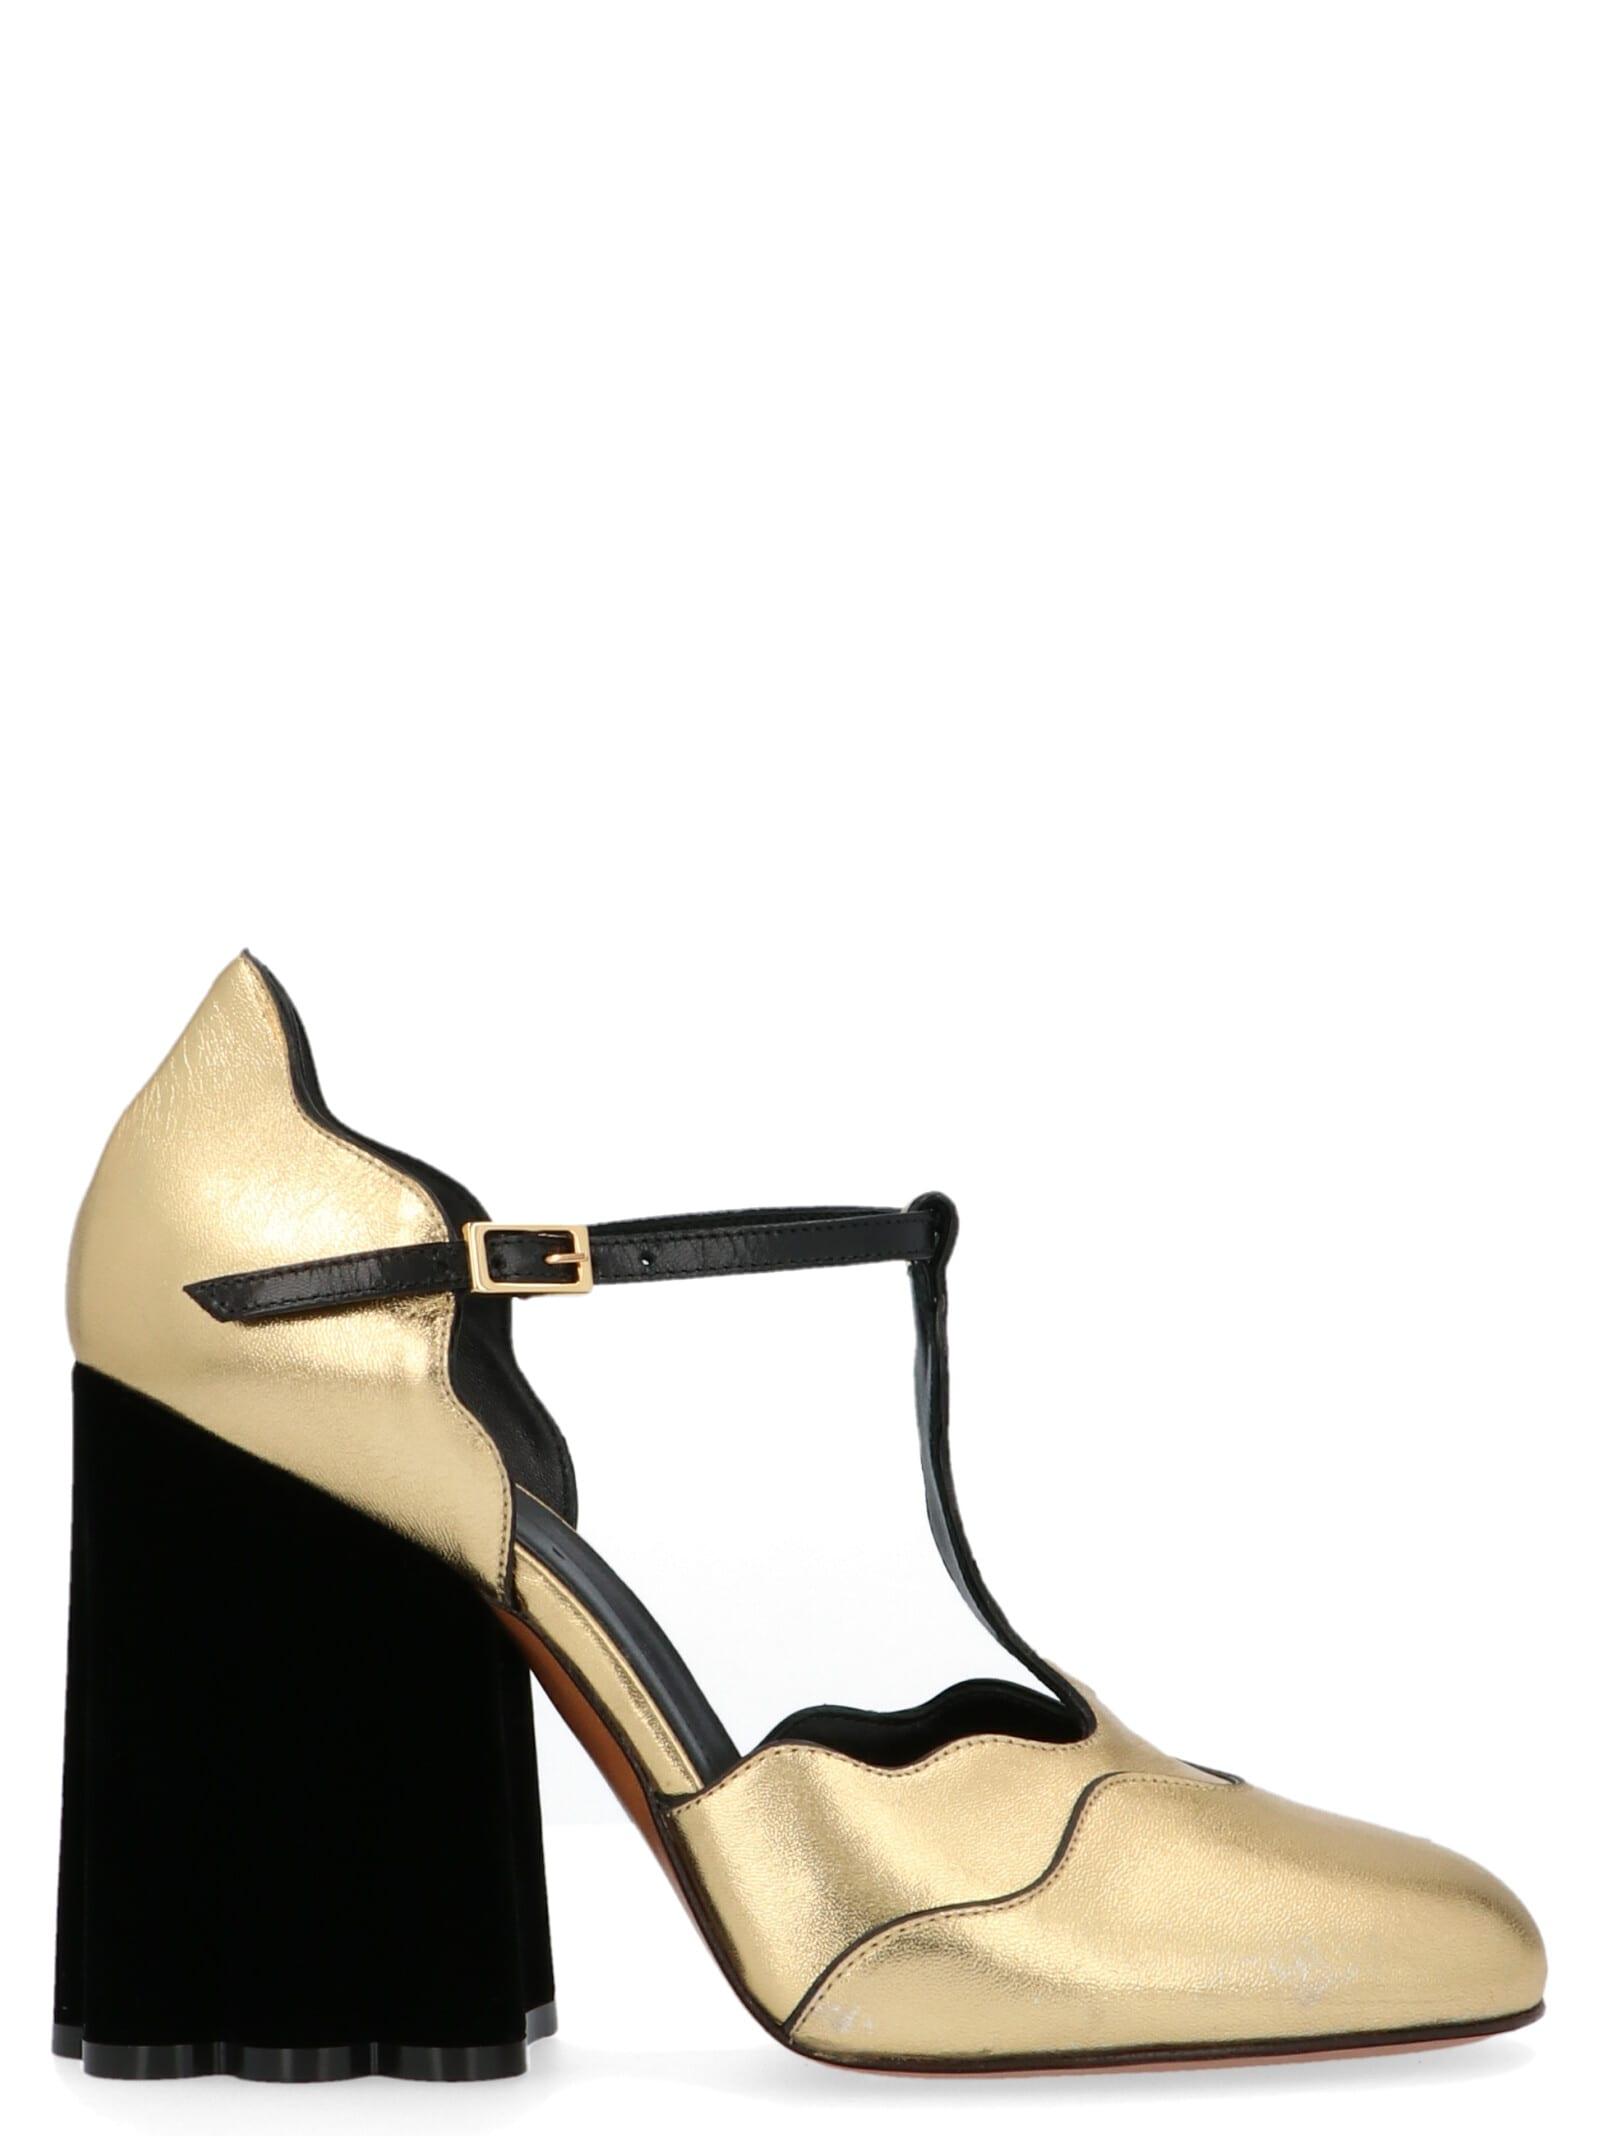 marni shoes on sale